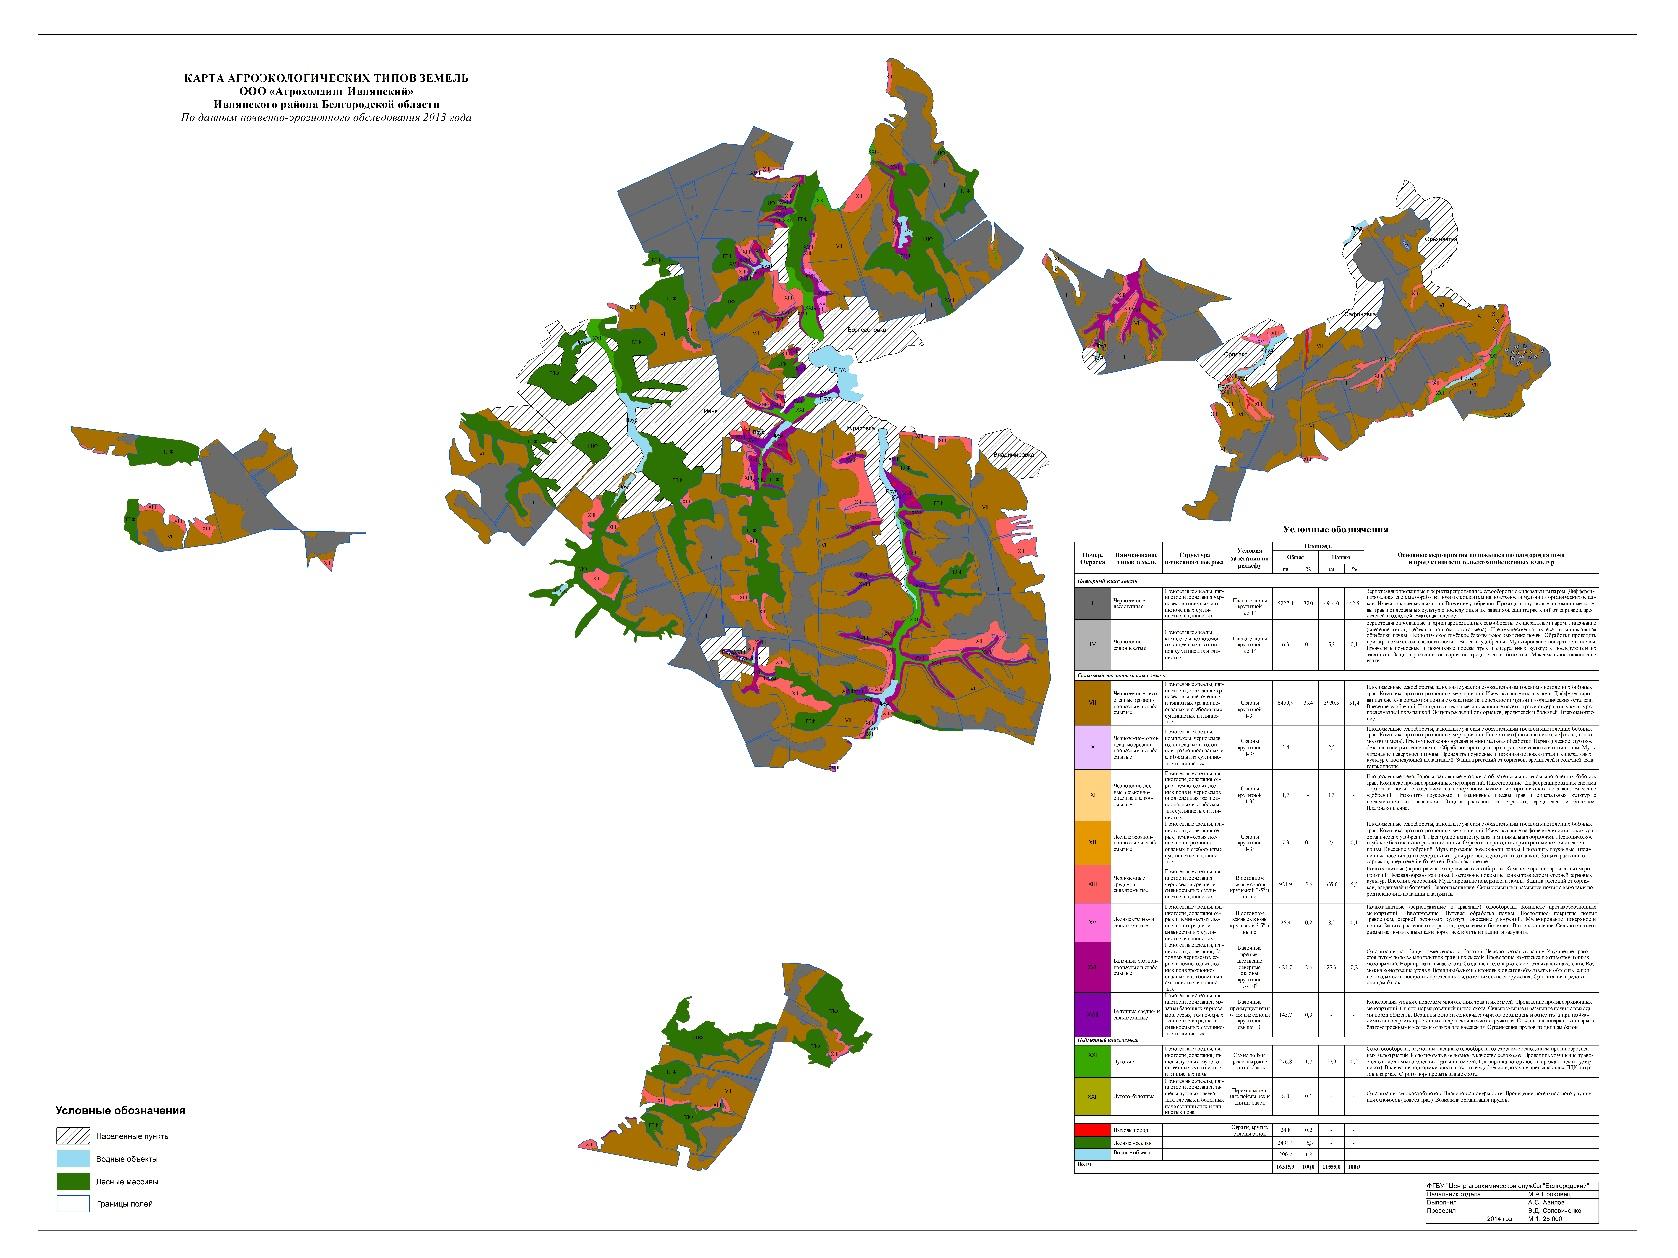 C:\Users\User\Documents\Белгород\Агрохолдинг Ивнянский Проект Белгородземпроект\Карты по подразделениям АХИ\Ивнянское подразделение Ивнянский район\Типизация.jpg